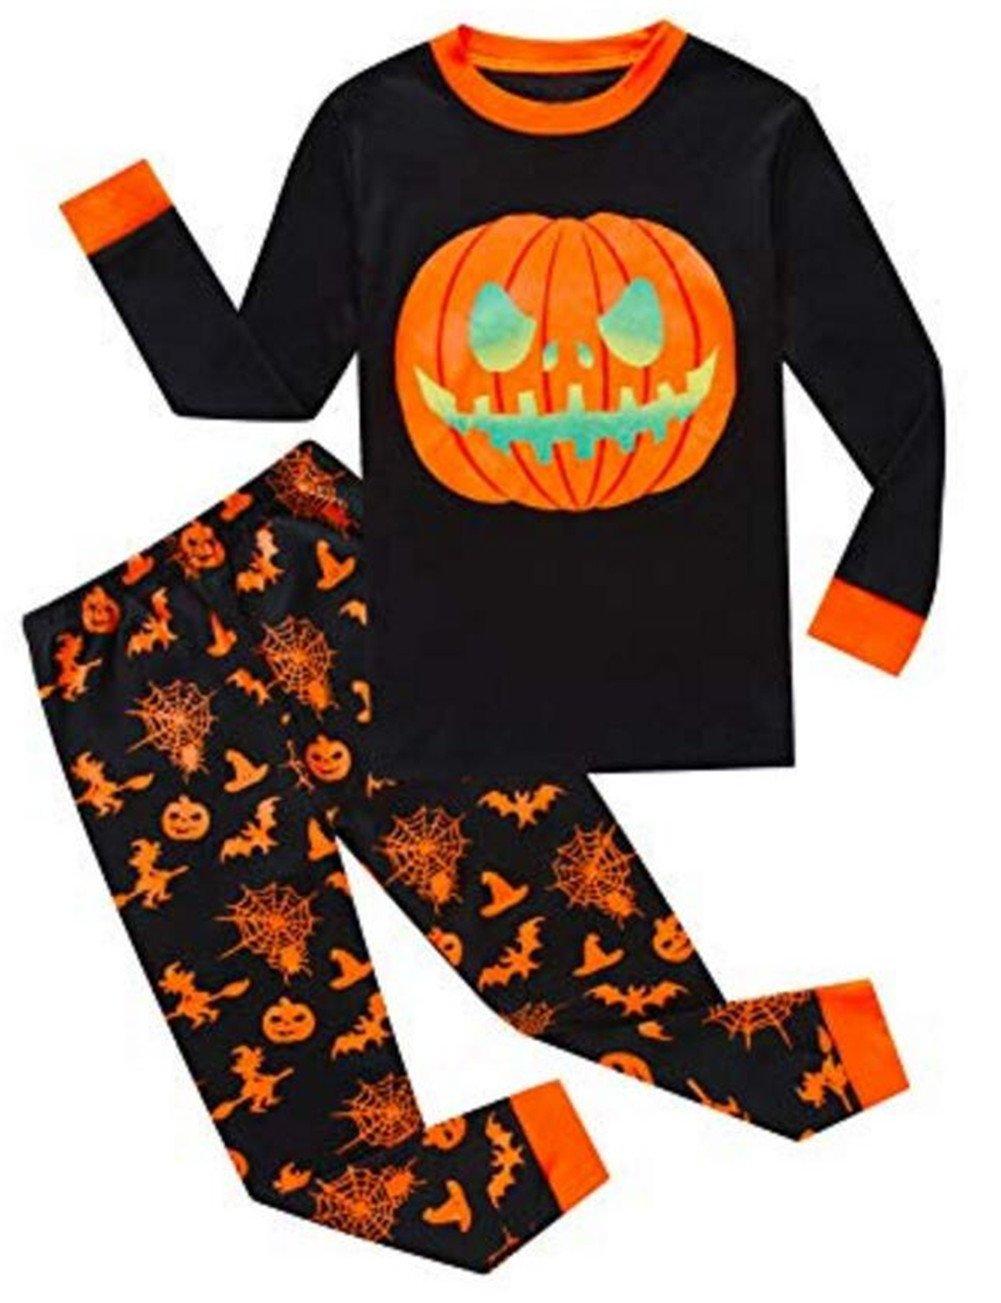 MOUSYA Kids Boys Girls Halloween Outfit Pumpkin Print T-Shirt Leggings Pants Set